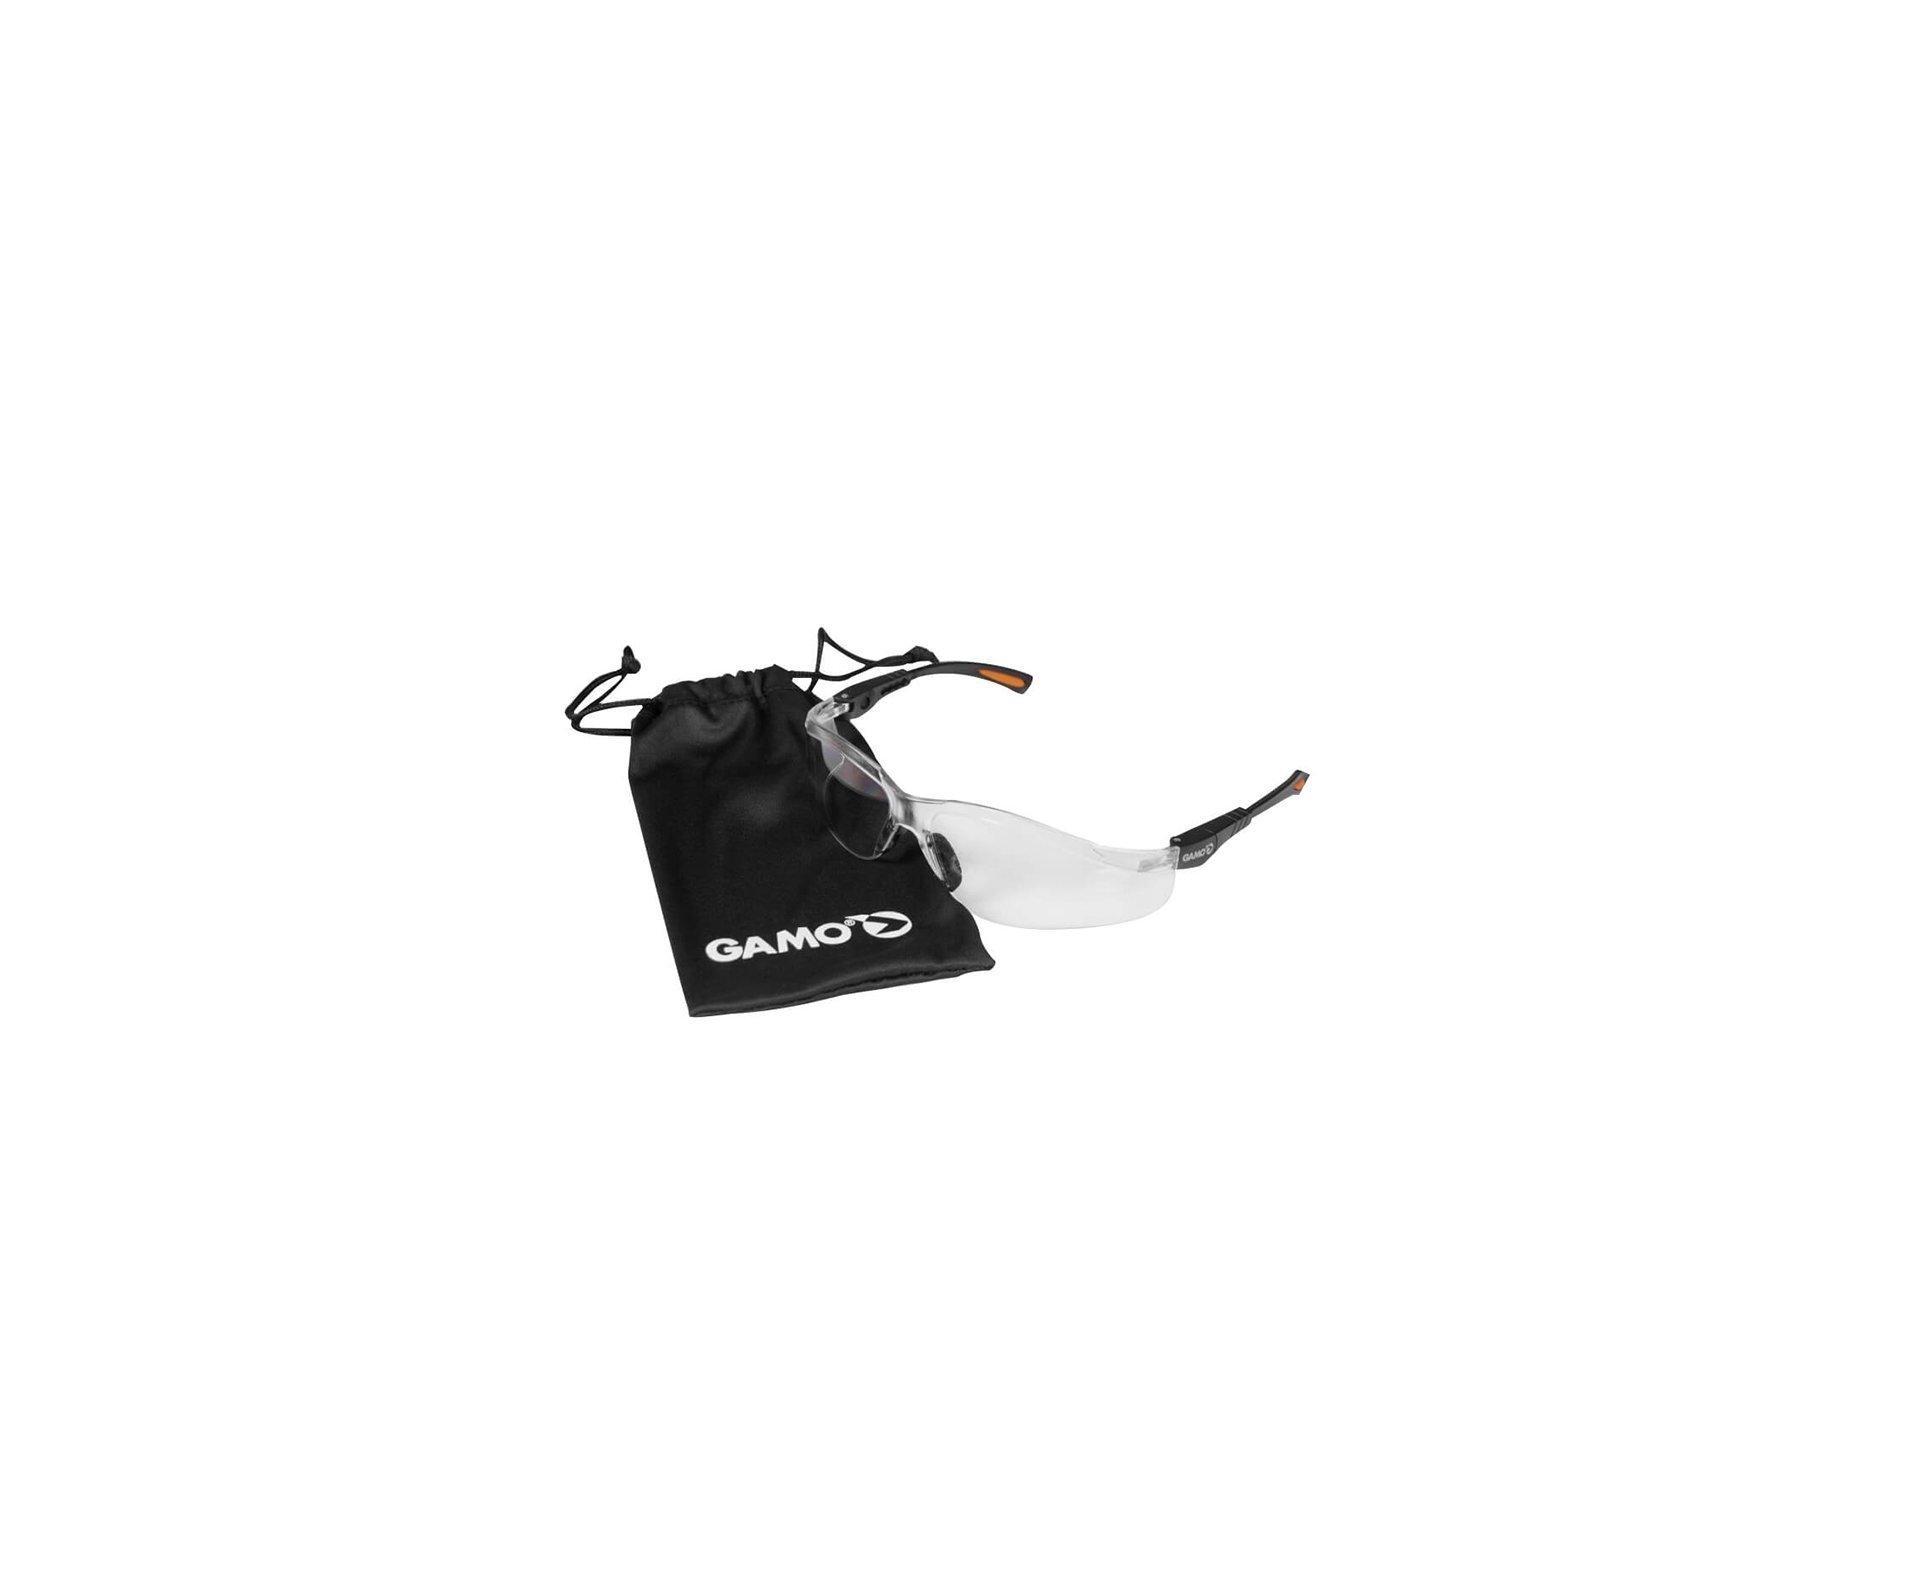 óculos Protetor Para Tiro Esportivo Gamo